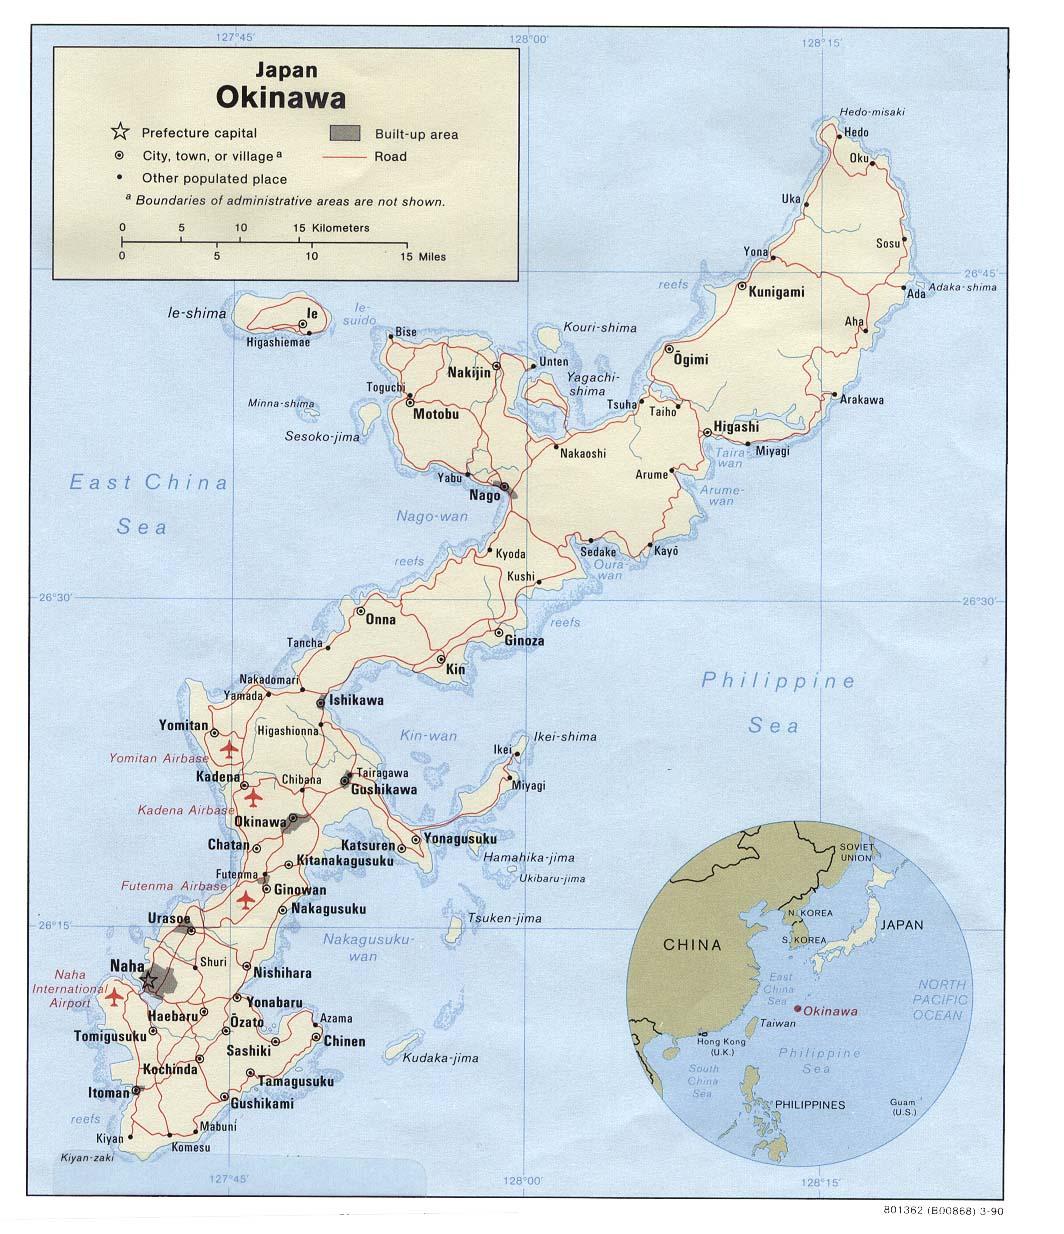 Mapa Politico de Okinawa, Japón